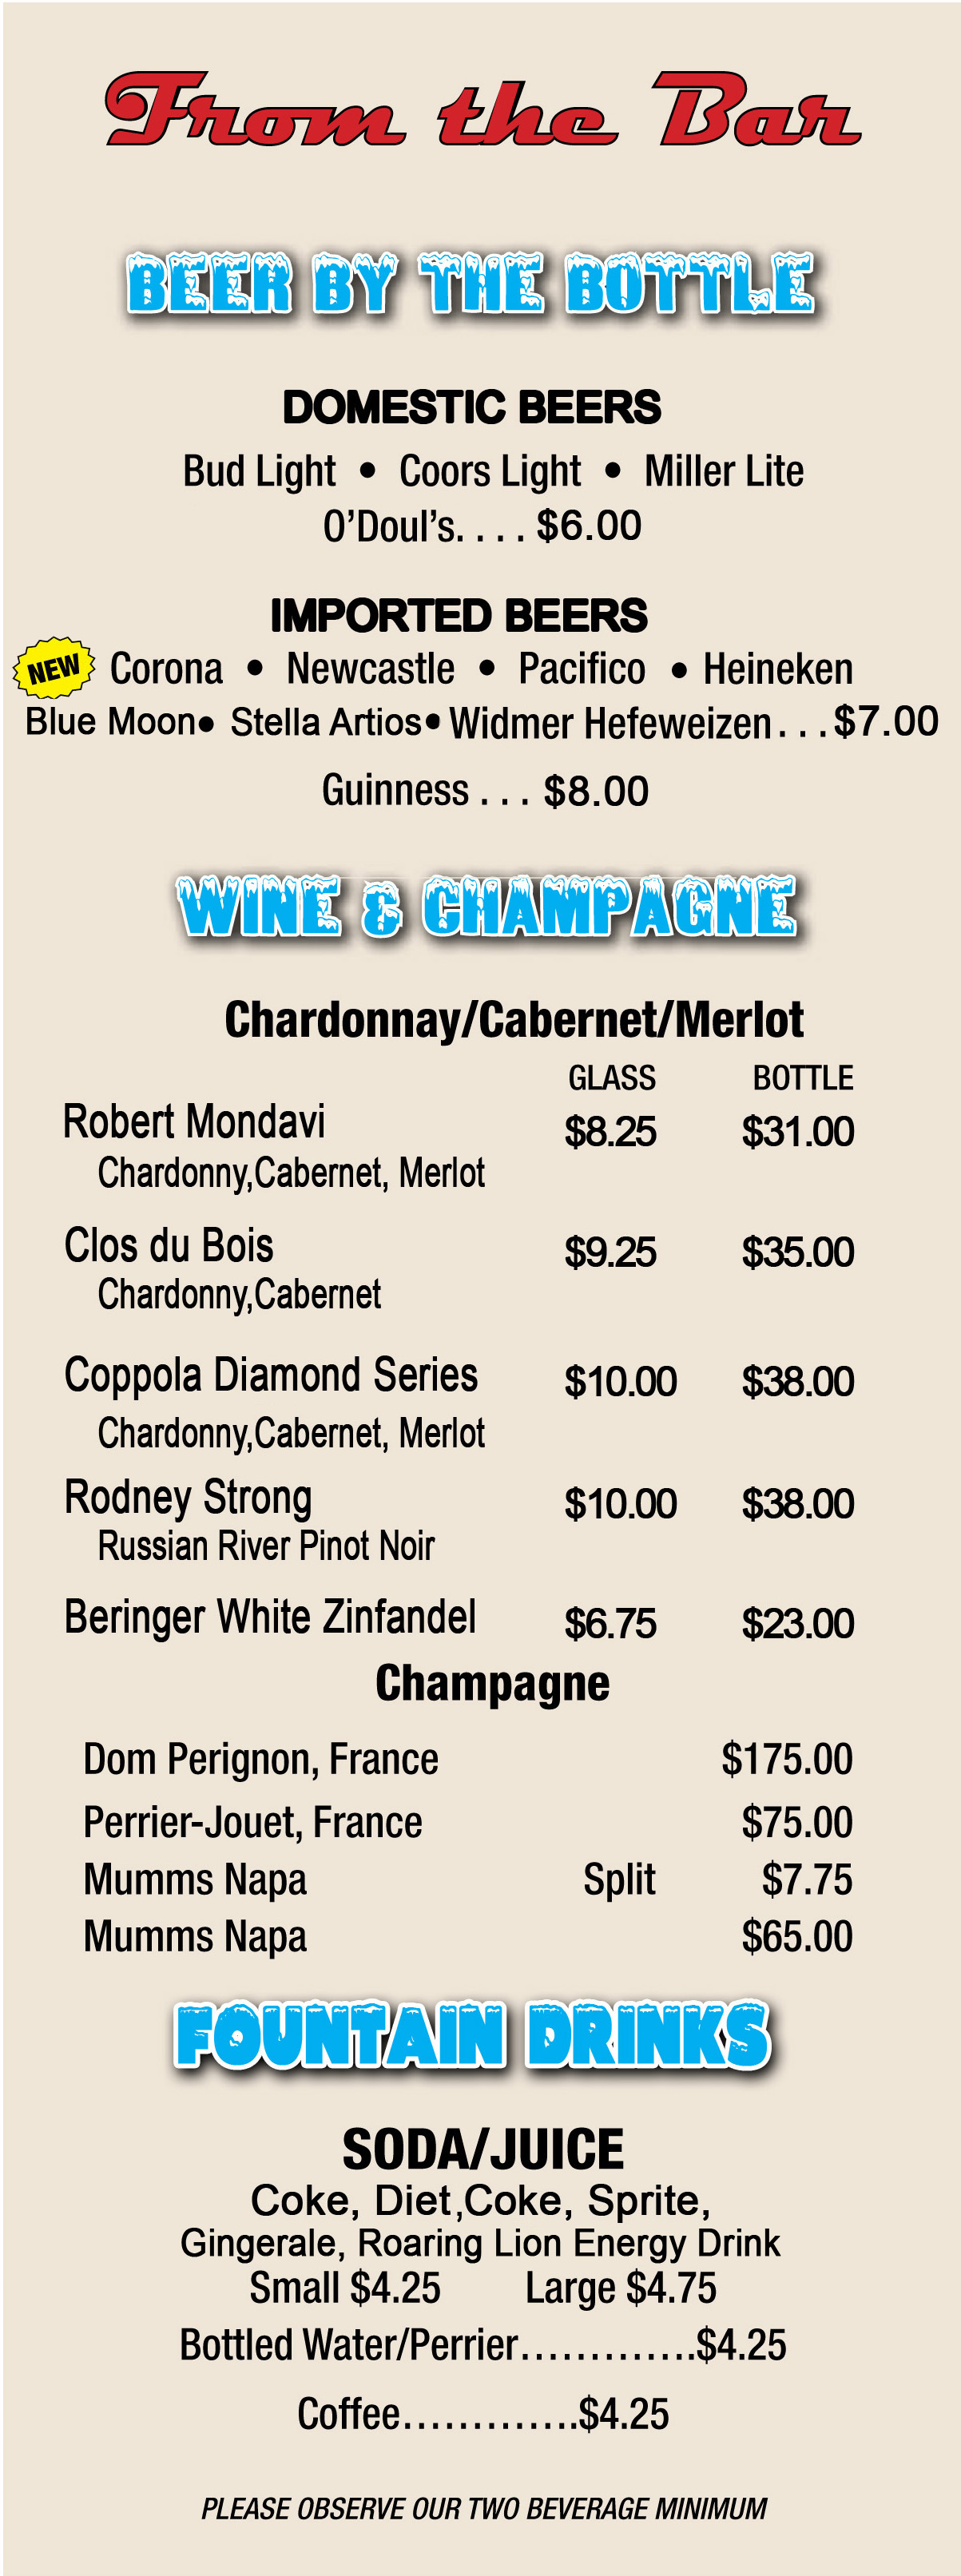 Exelent Sample Wine Menu Template Festooning Administrative - Beverage menu template